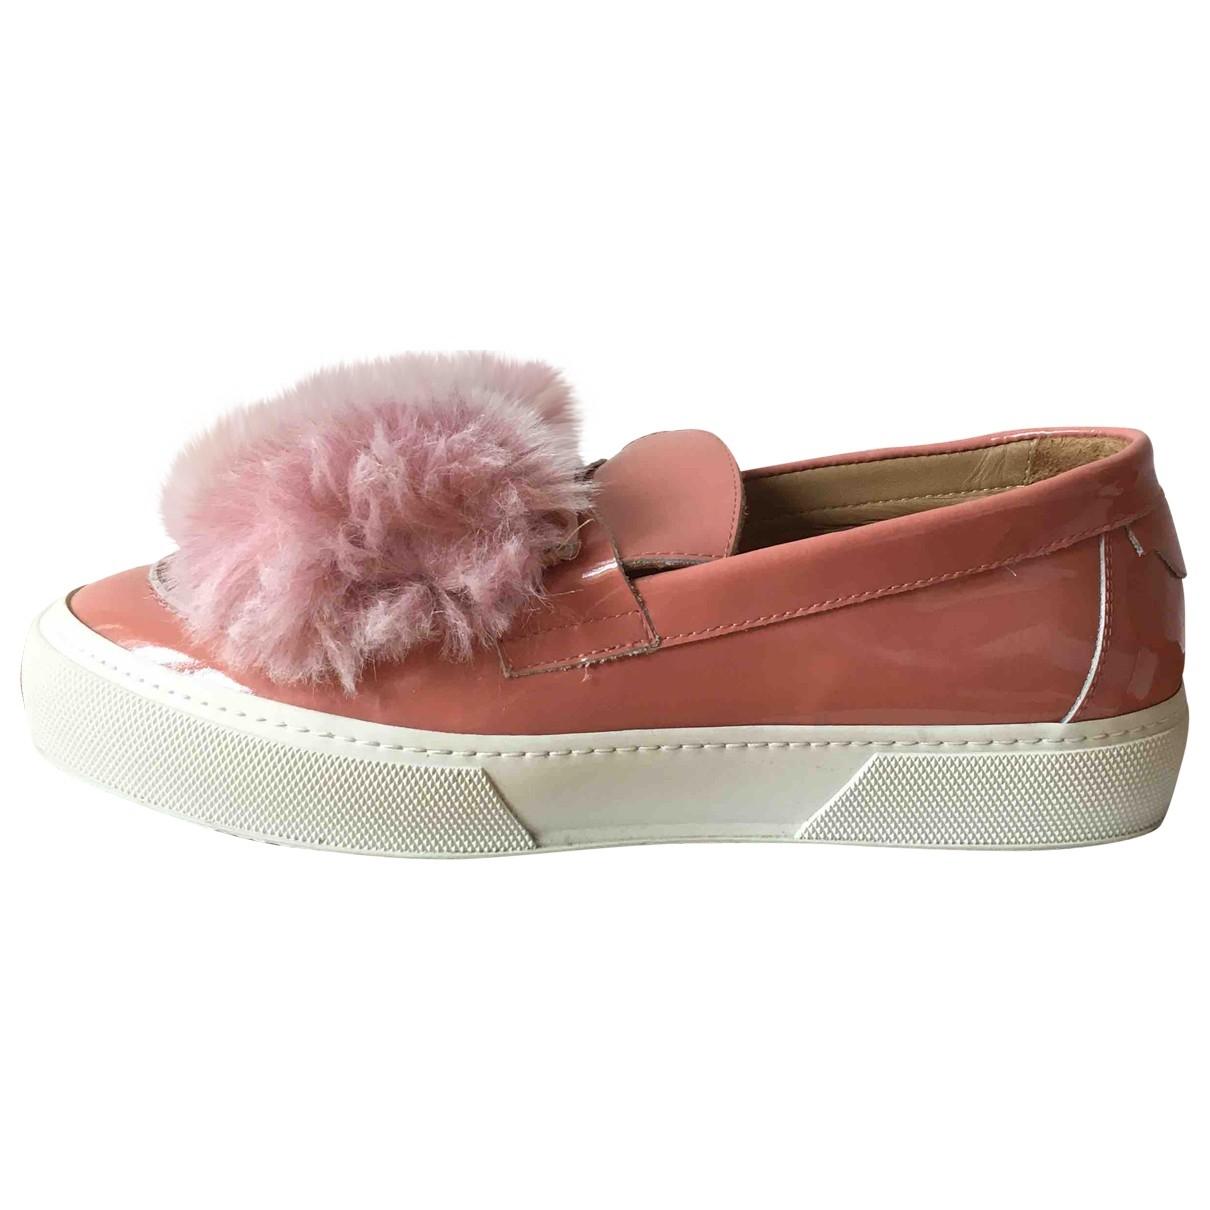 Deportivas de Charol Lf Shoes